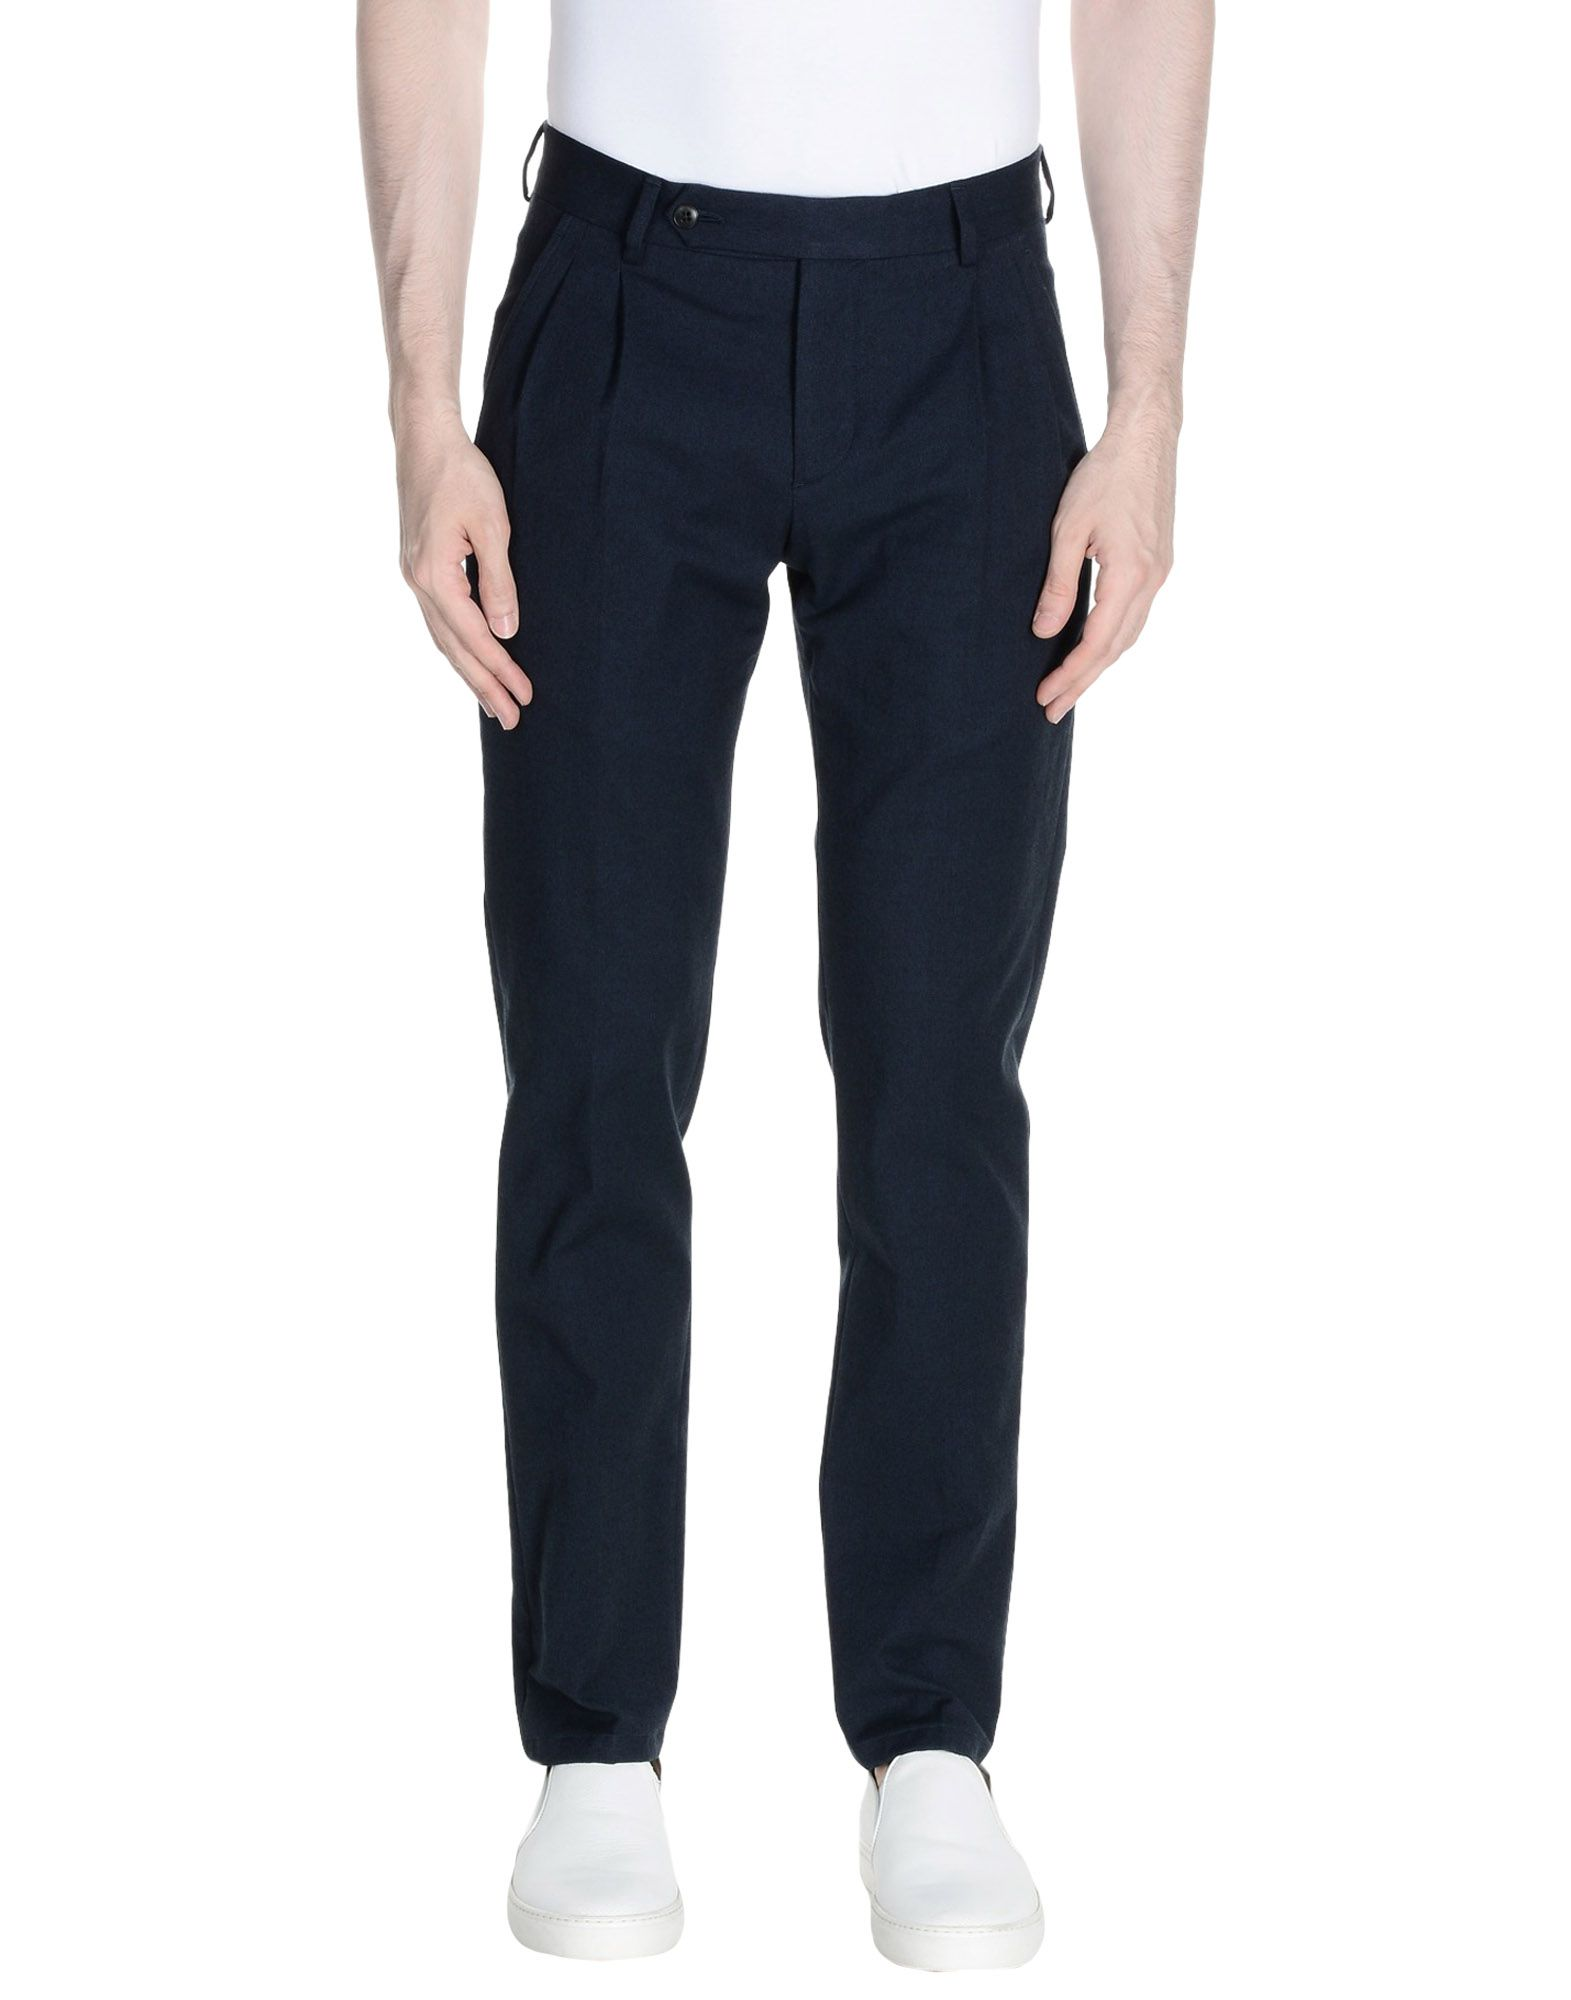 Pantalone Aglini uomo - - 13196501XL  billiger Laden